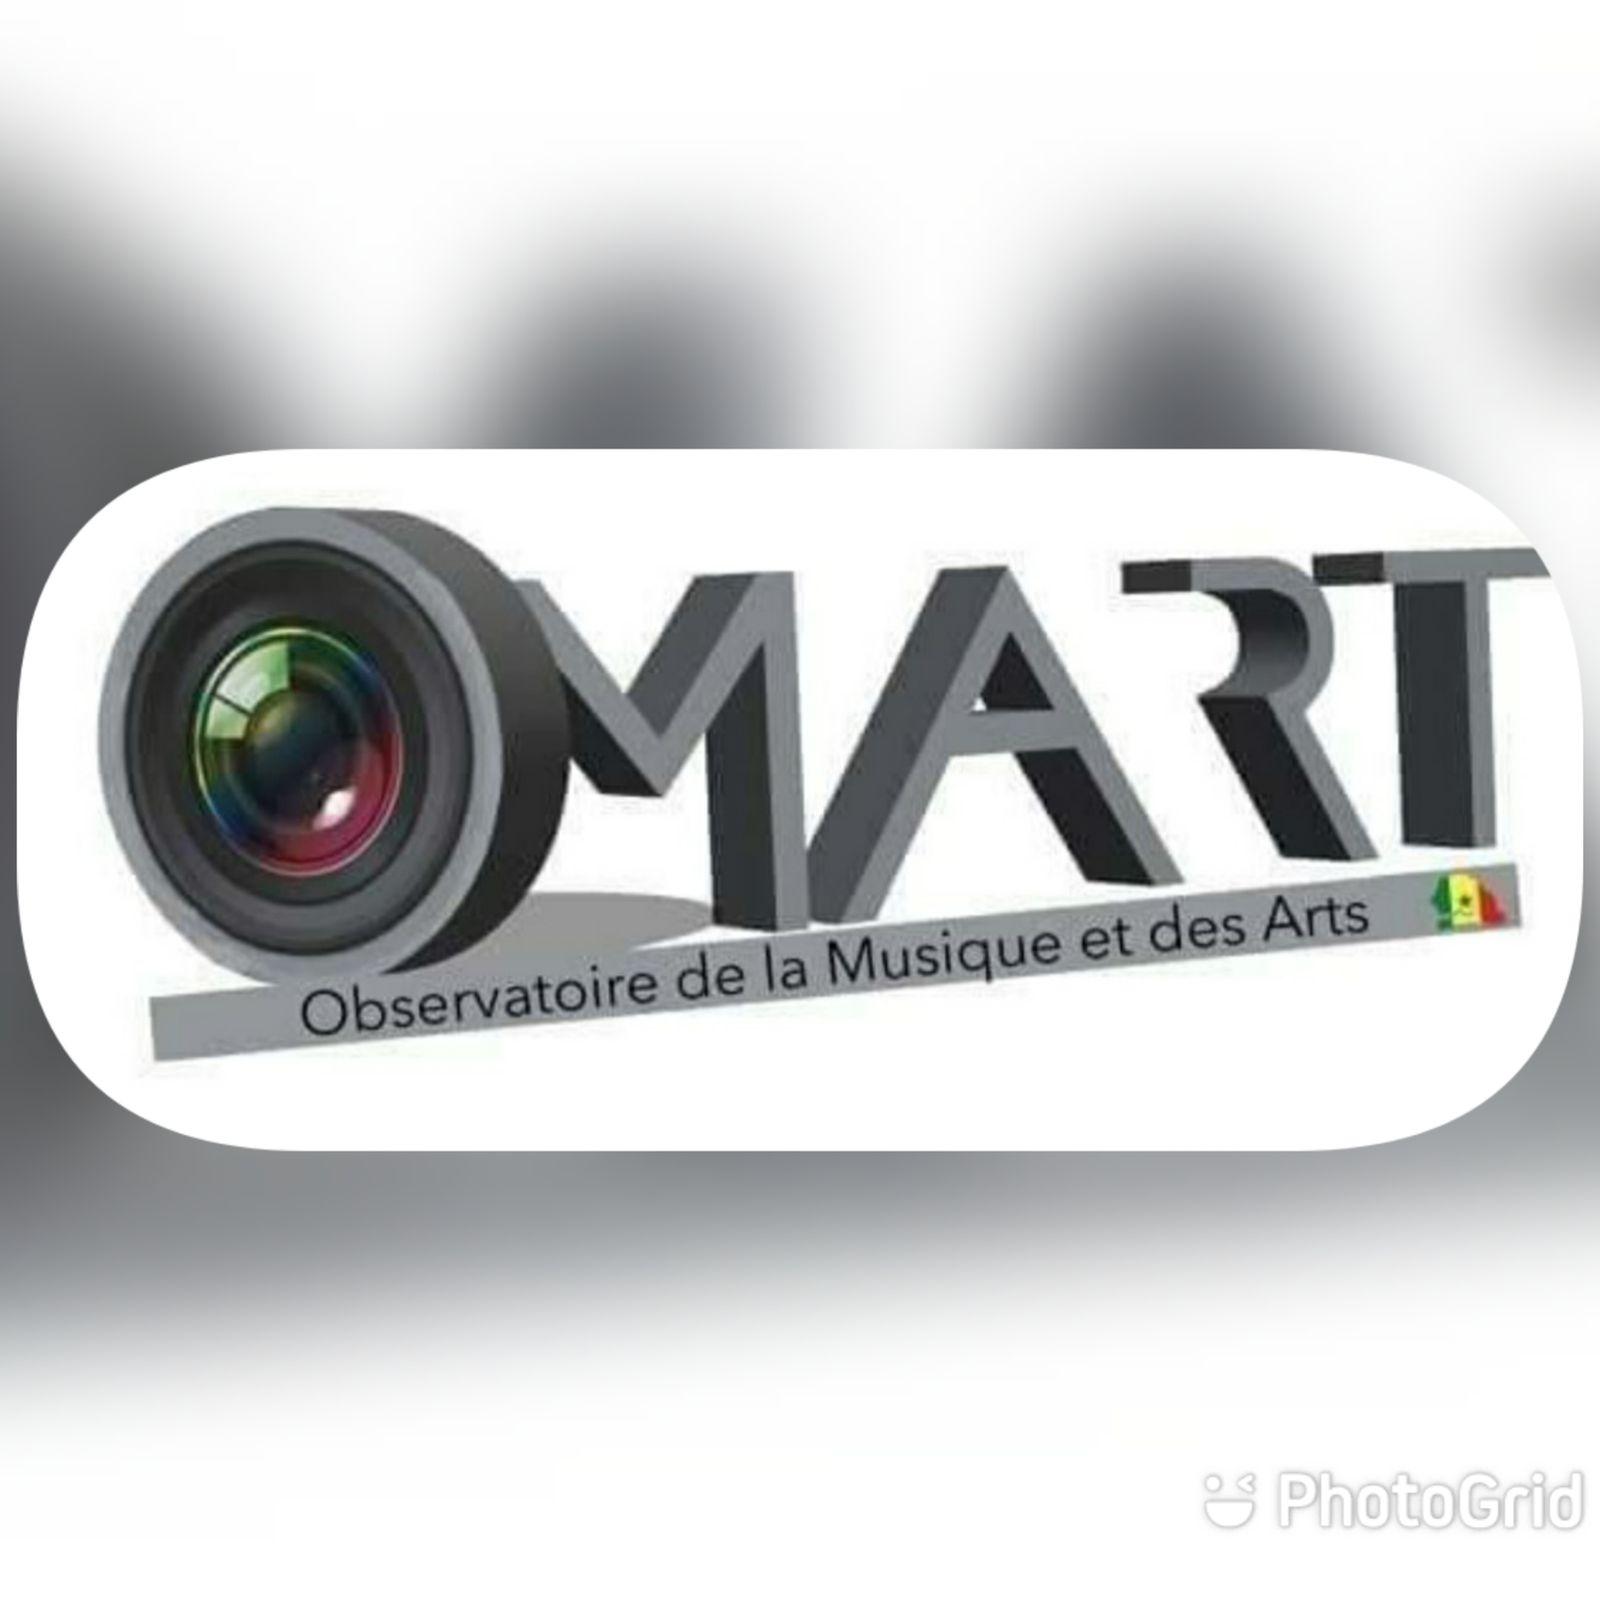 omart-senegal.over-blog.com